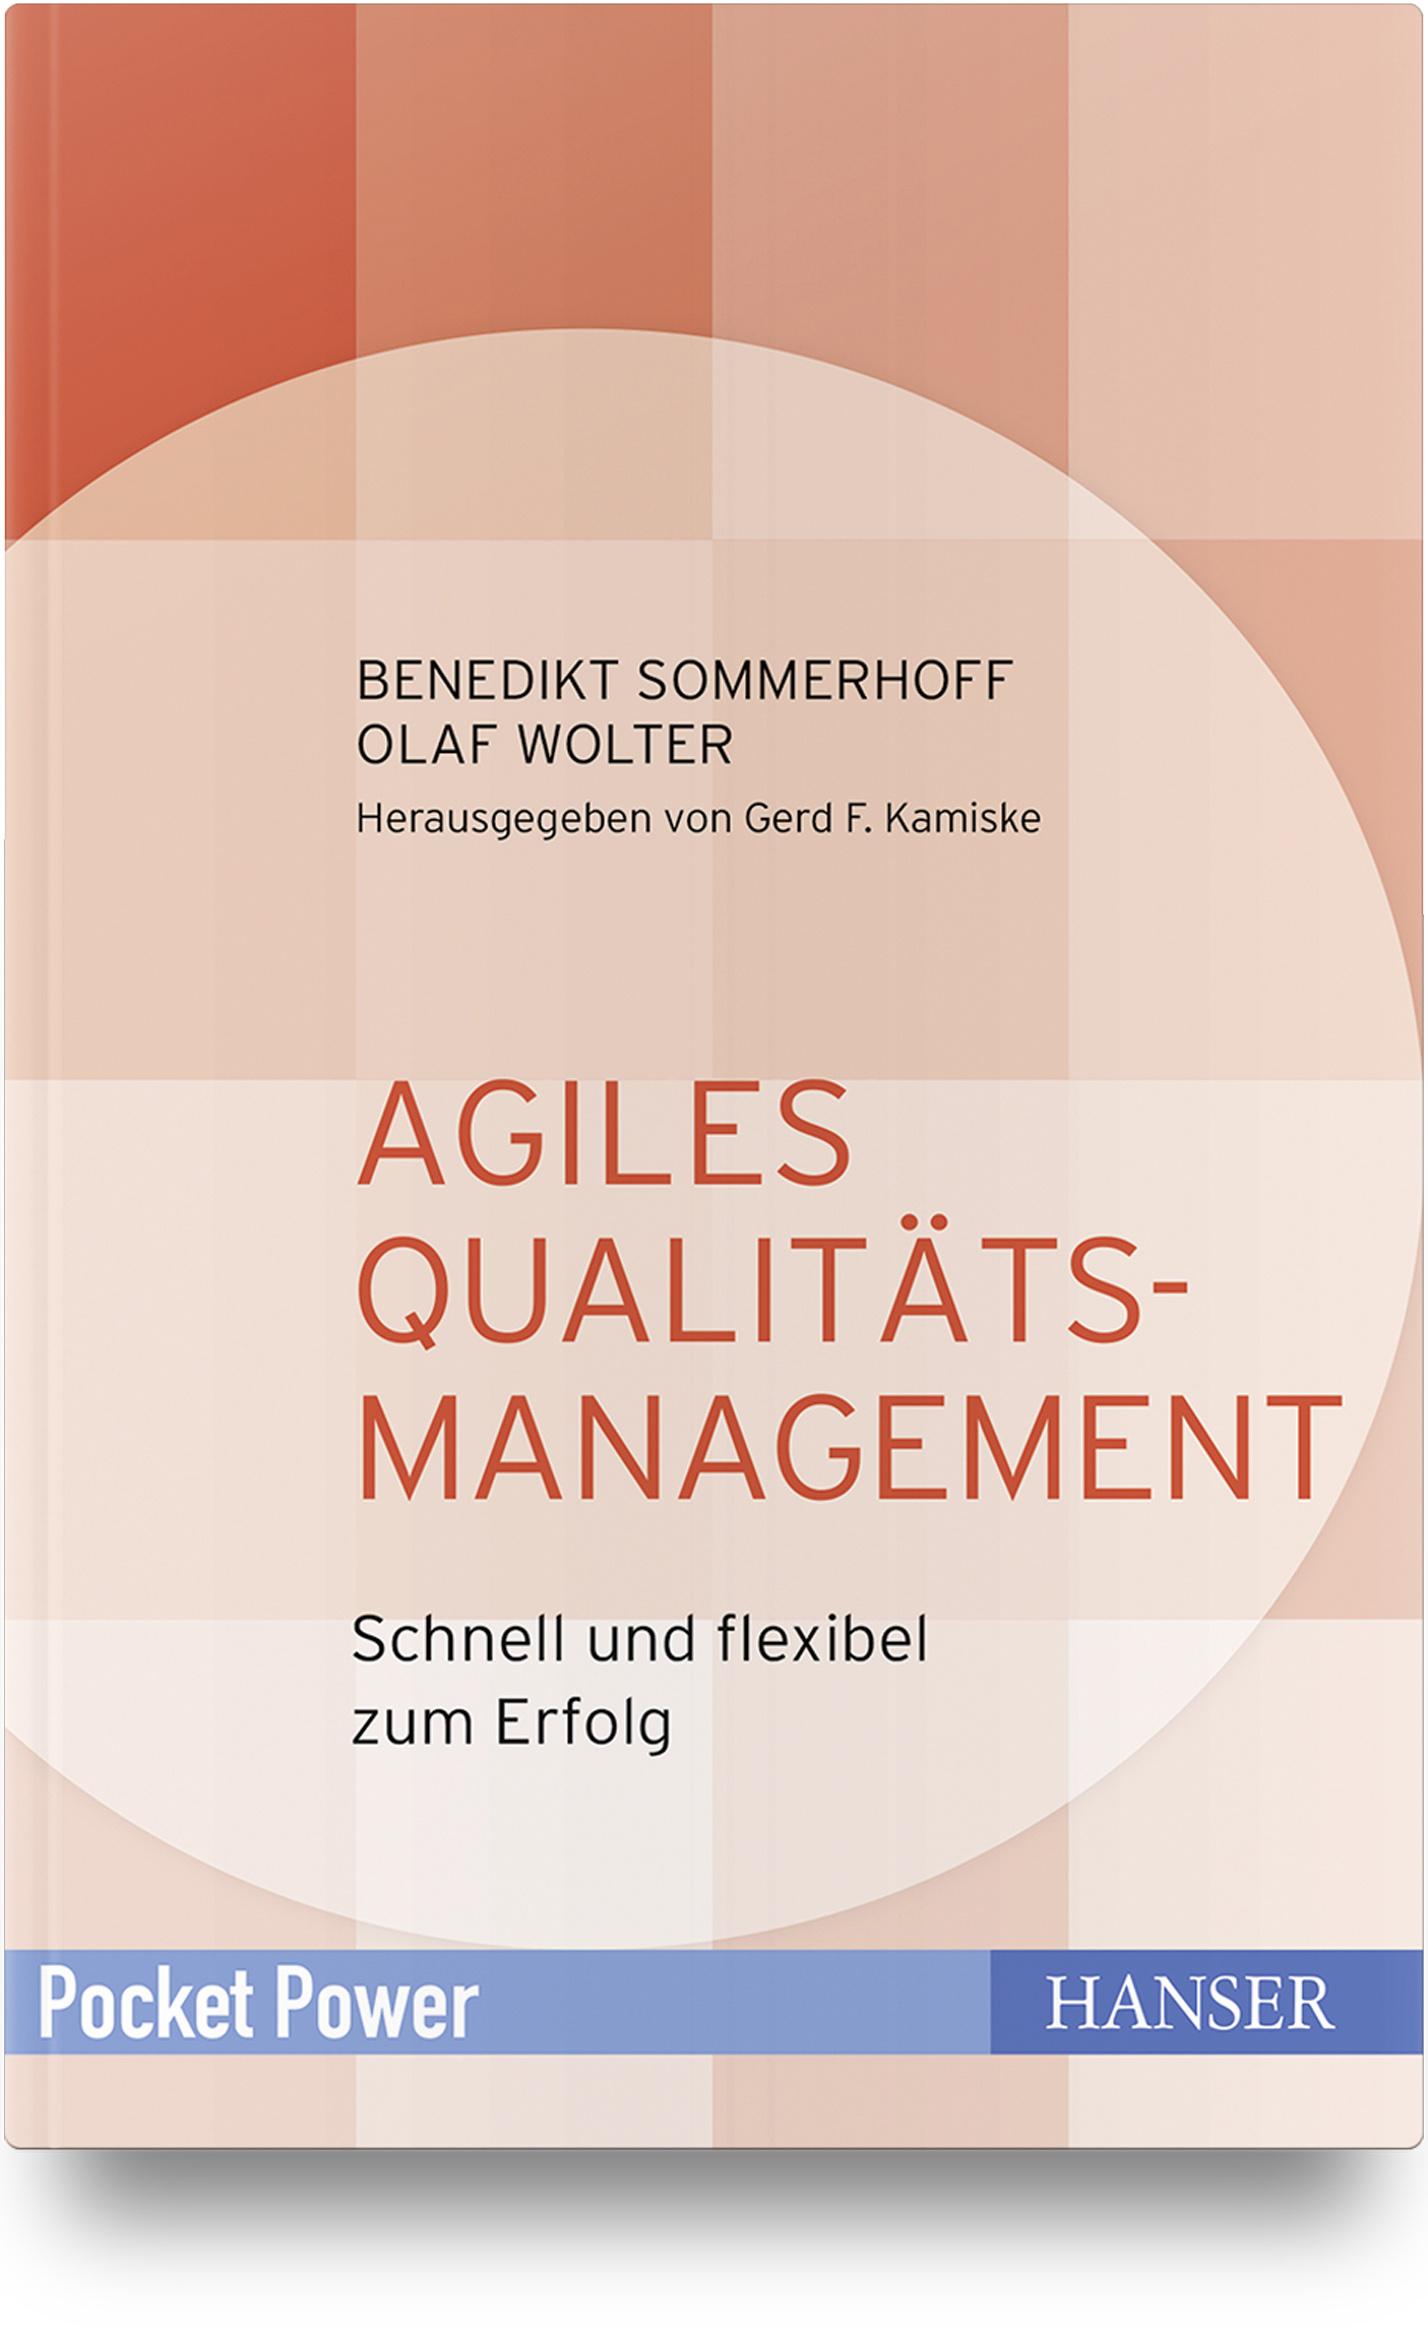 Wolter, Sommerhoff, Agiles Qualitätsmanagement, 978-3-446-45574-0